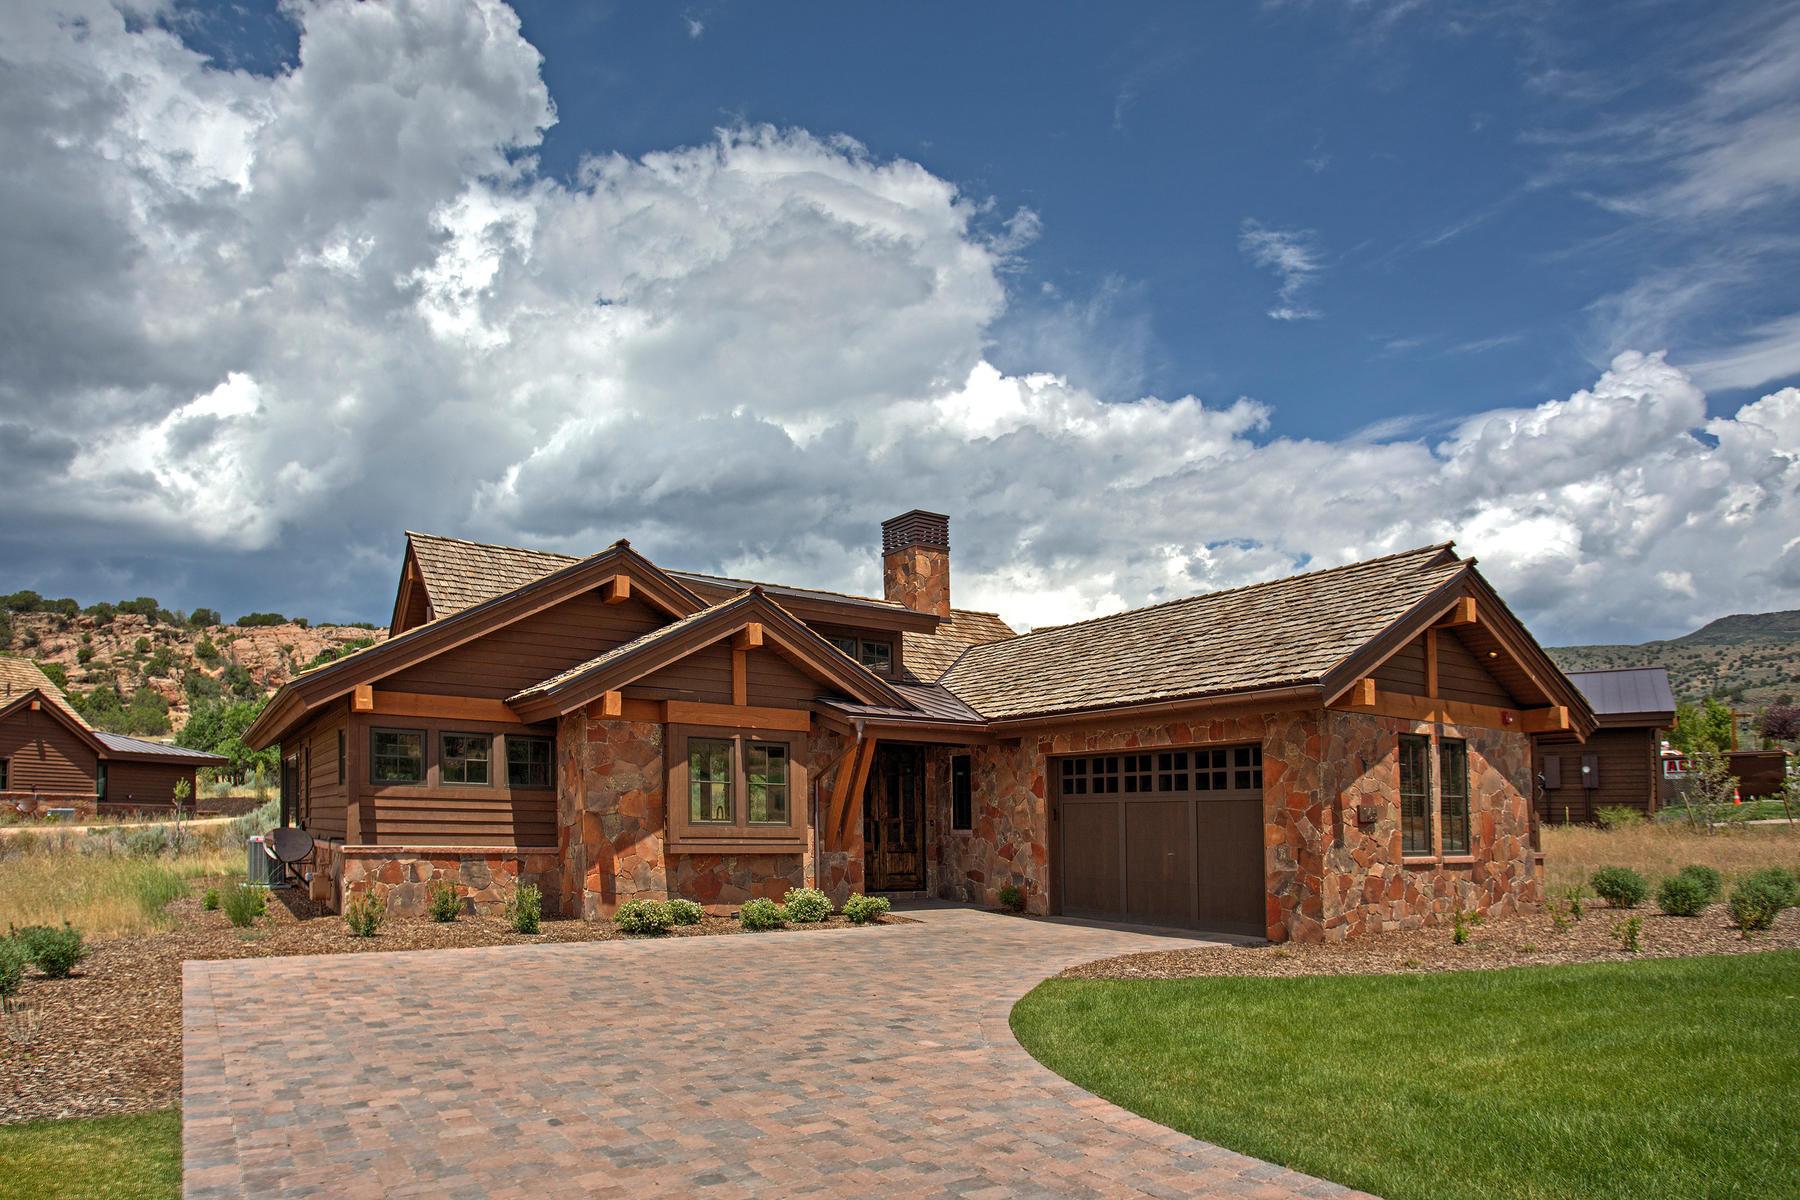 Moradia para Venda às A Sophisticated Golf Retreat Among the Junipers and Red Rocks 165 N Club Cabins Ct #4, Heber City, Utah, 84032 Estados Unidos